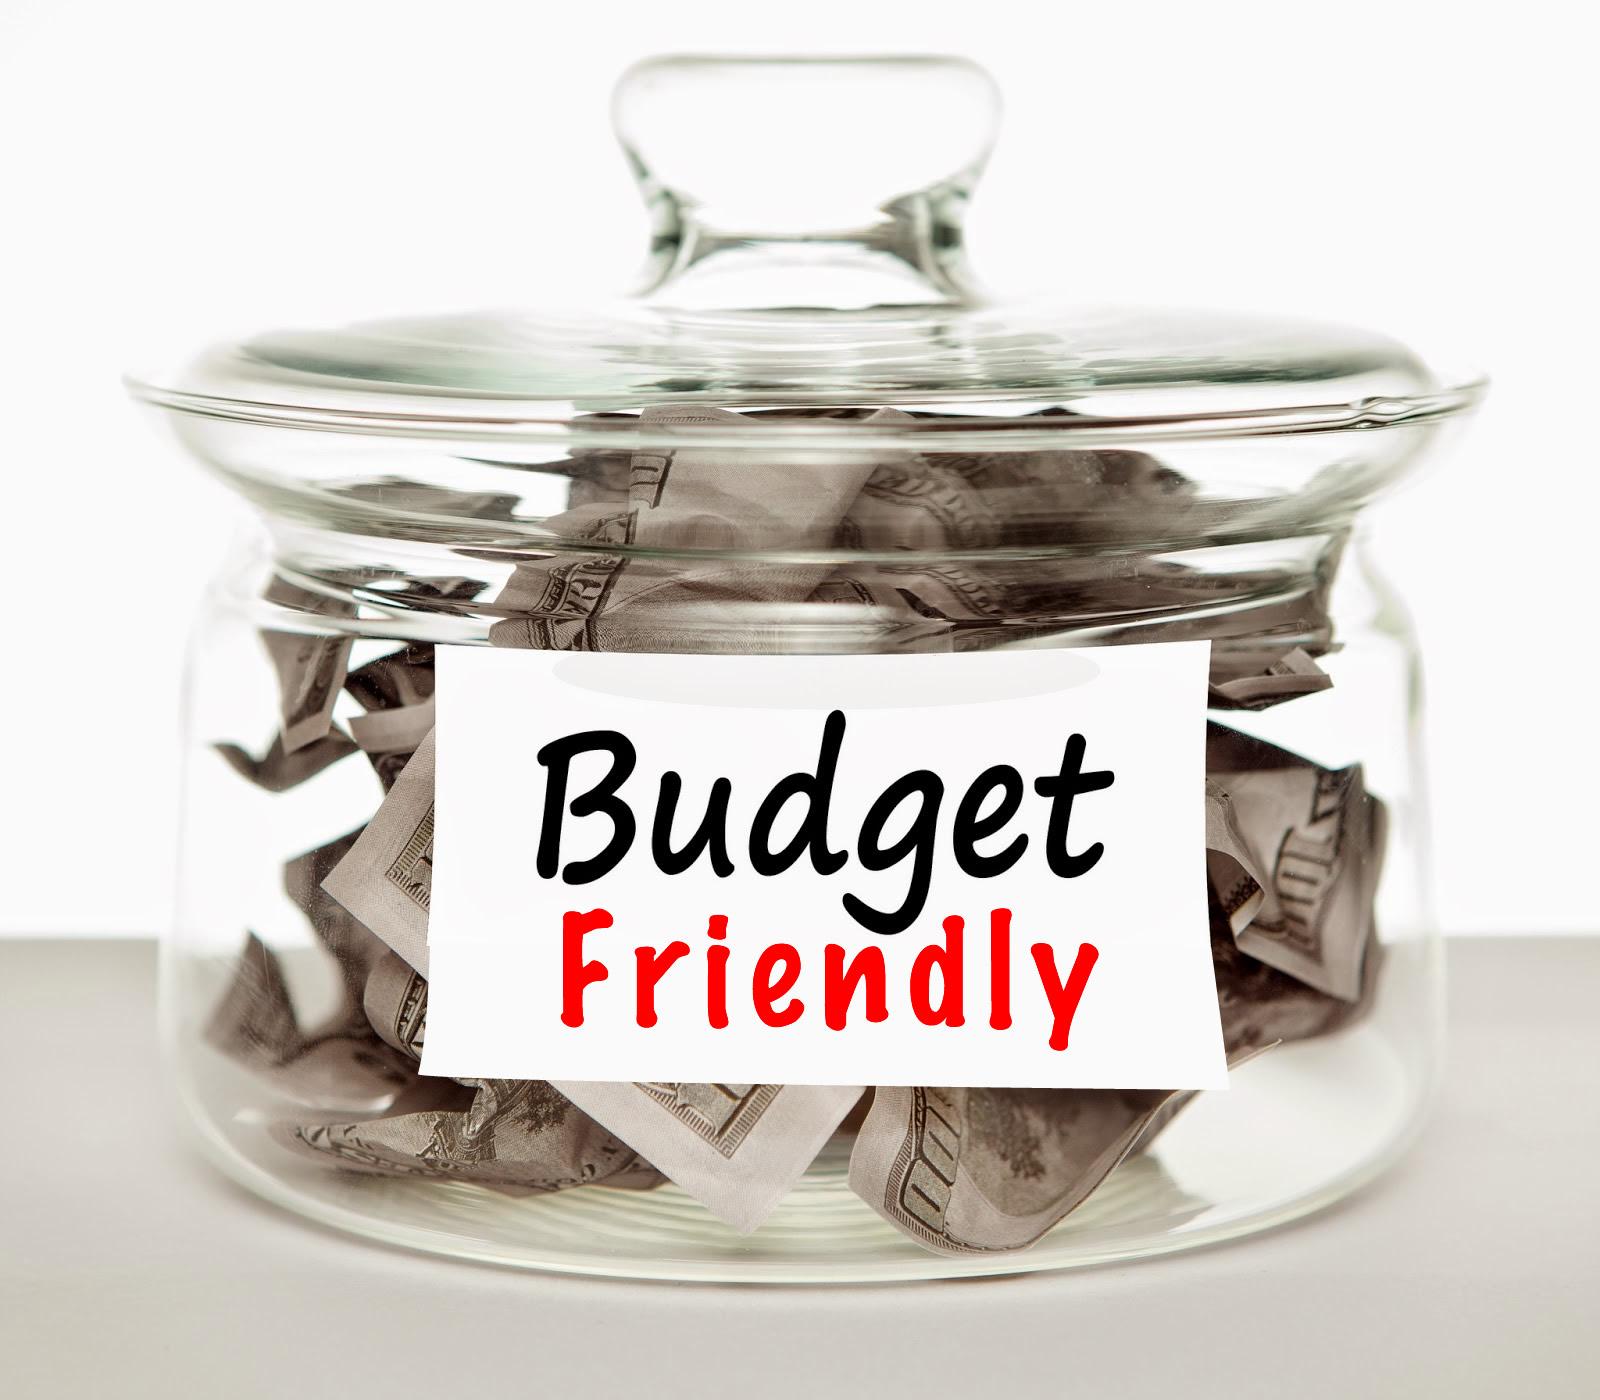 Budgetvriendelijk